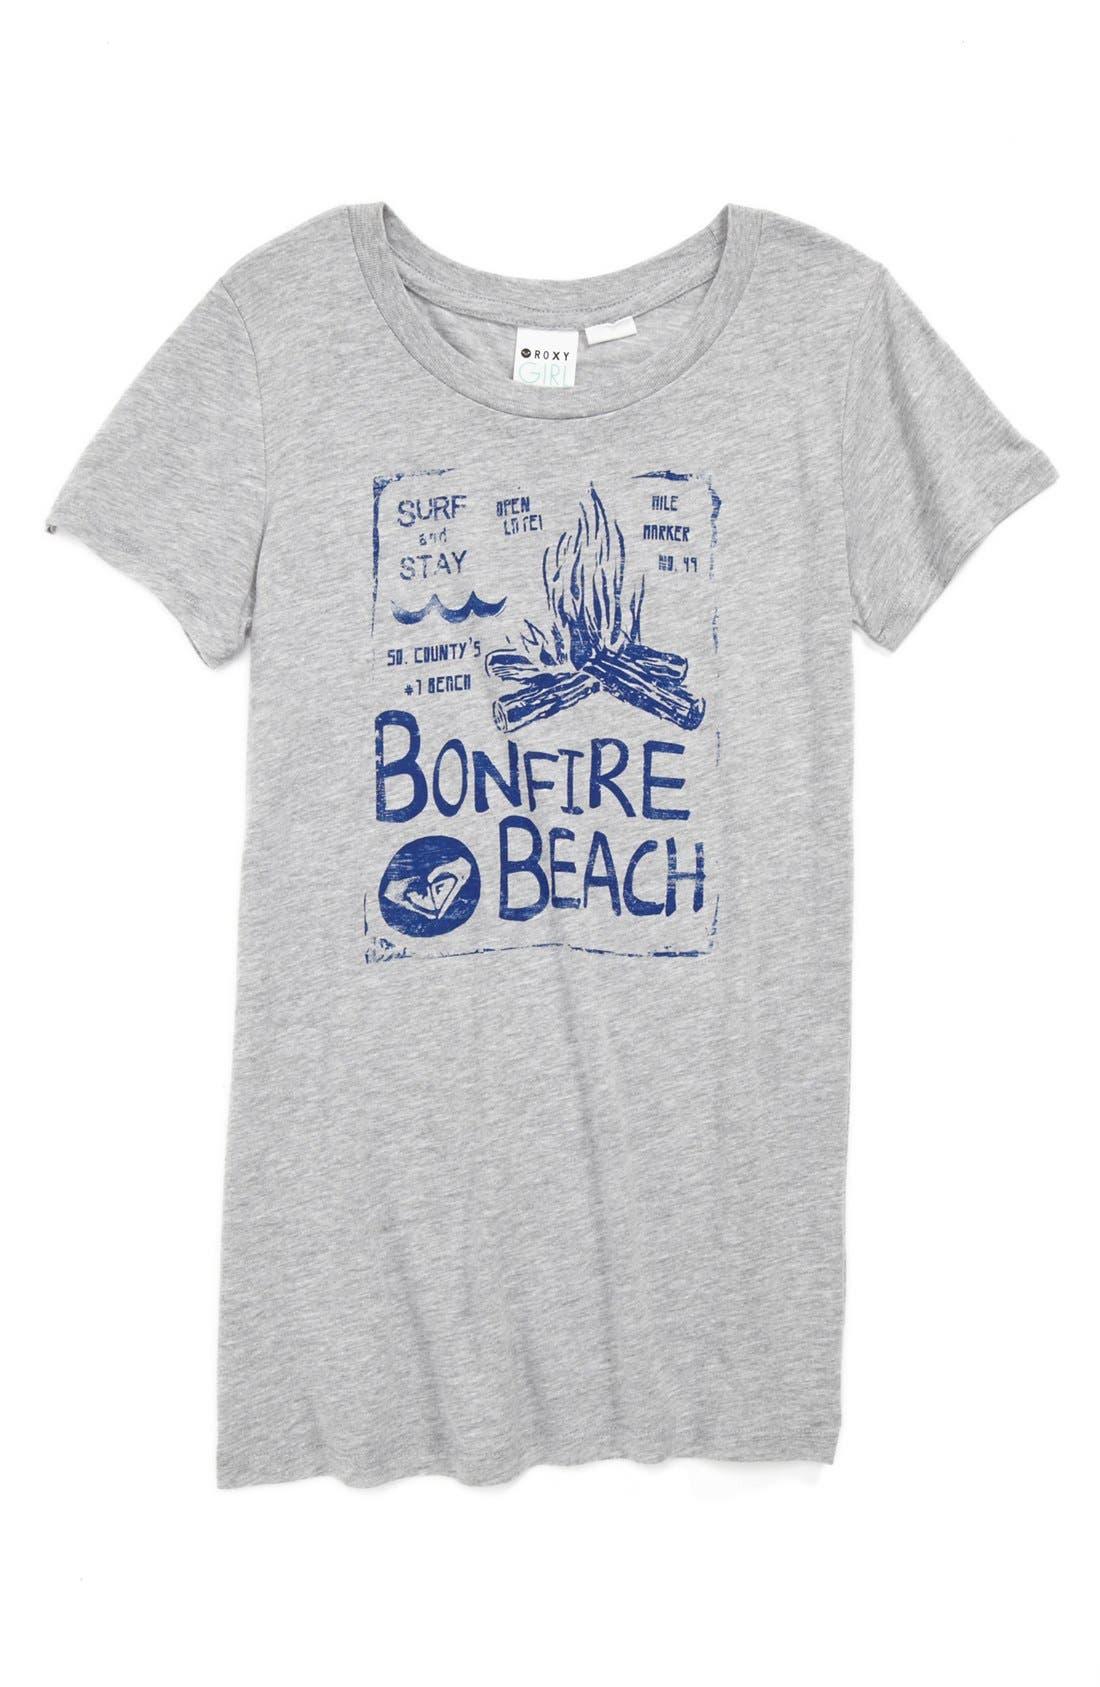 Alternate Image 1 Selected - Roxy 'Bonfire Beach' Graphic Tee (Big Girls)